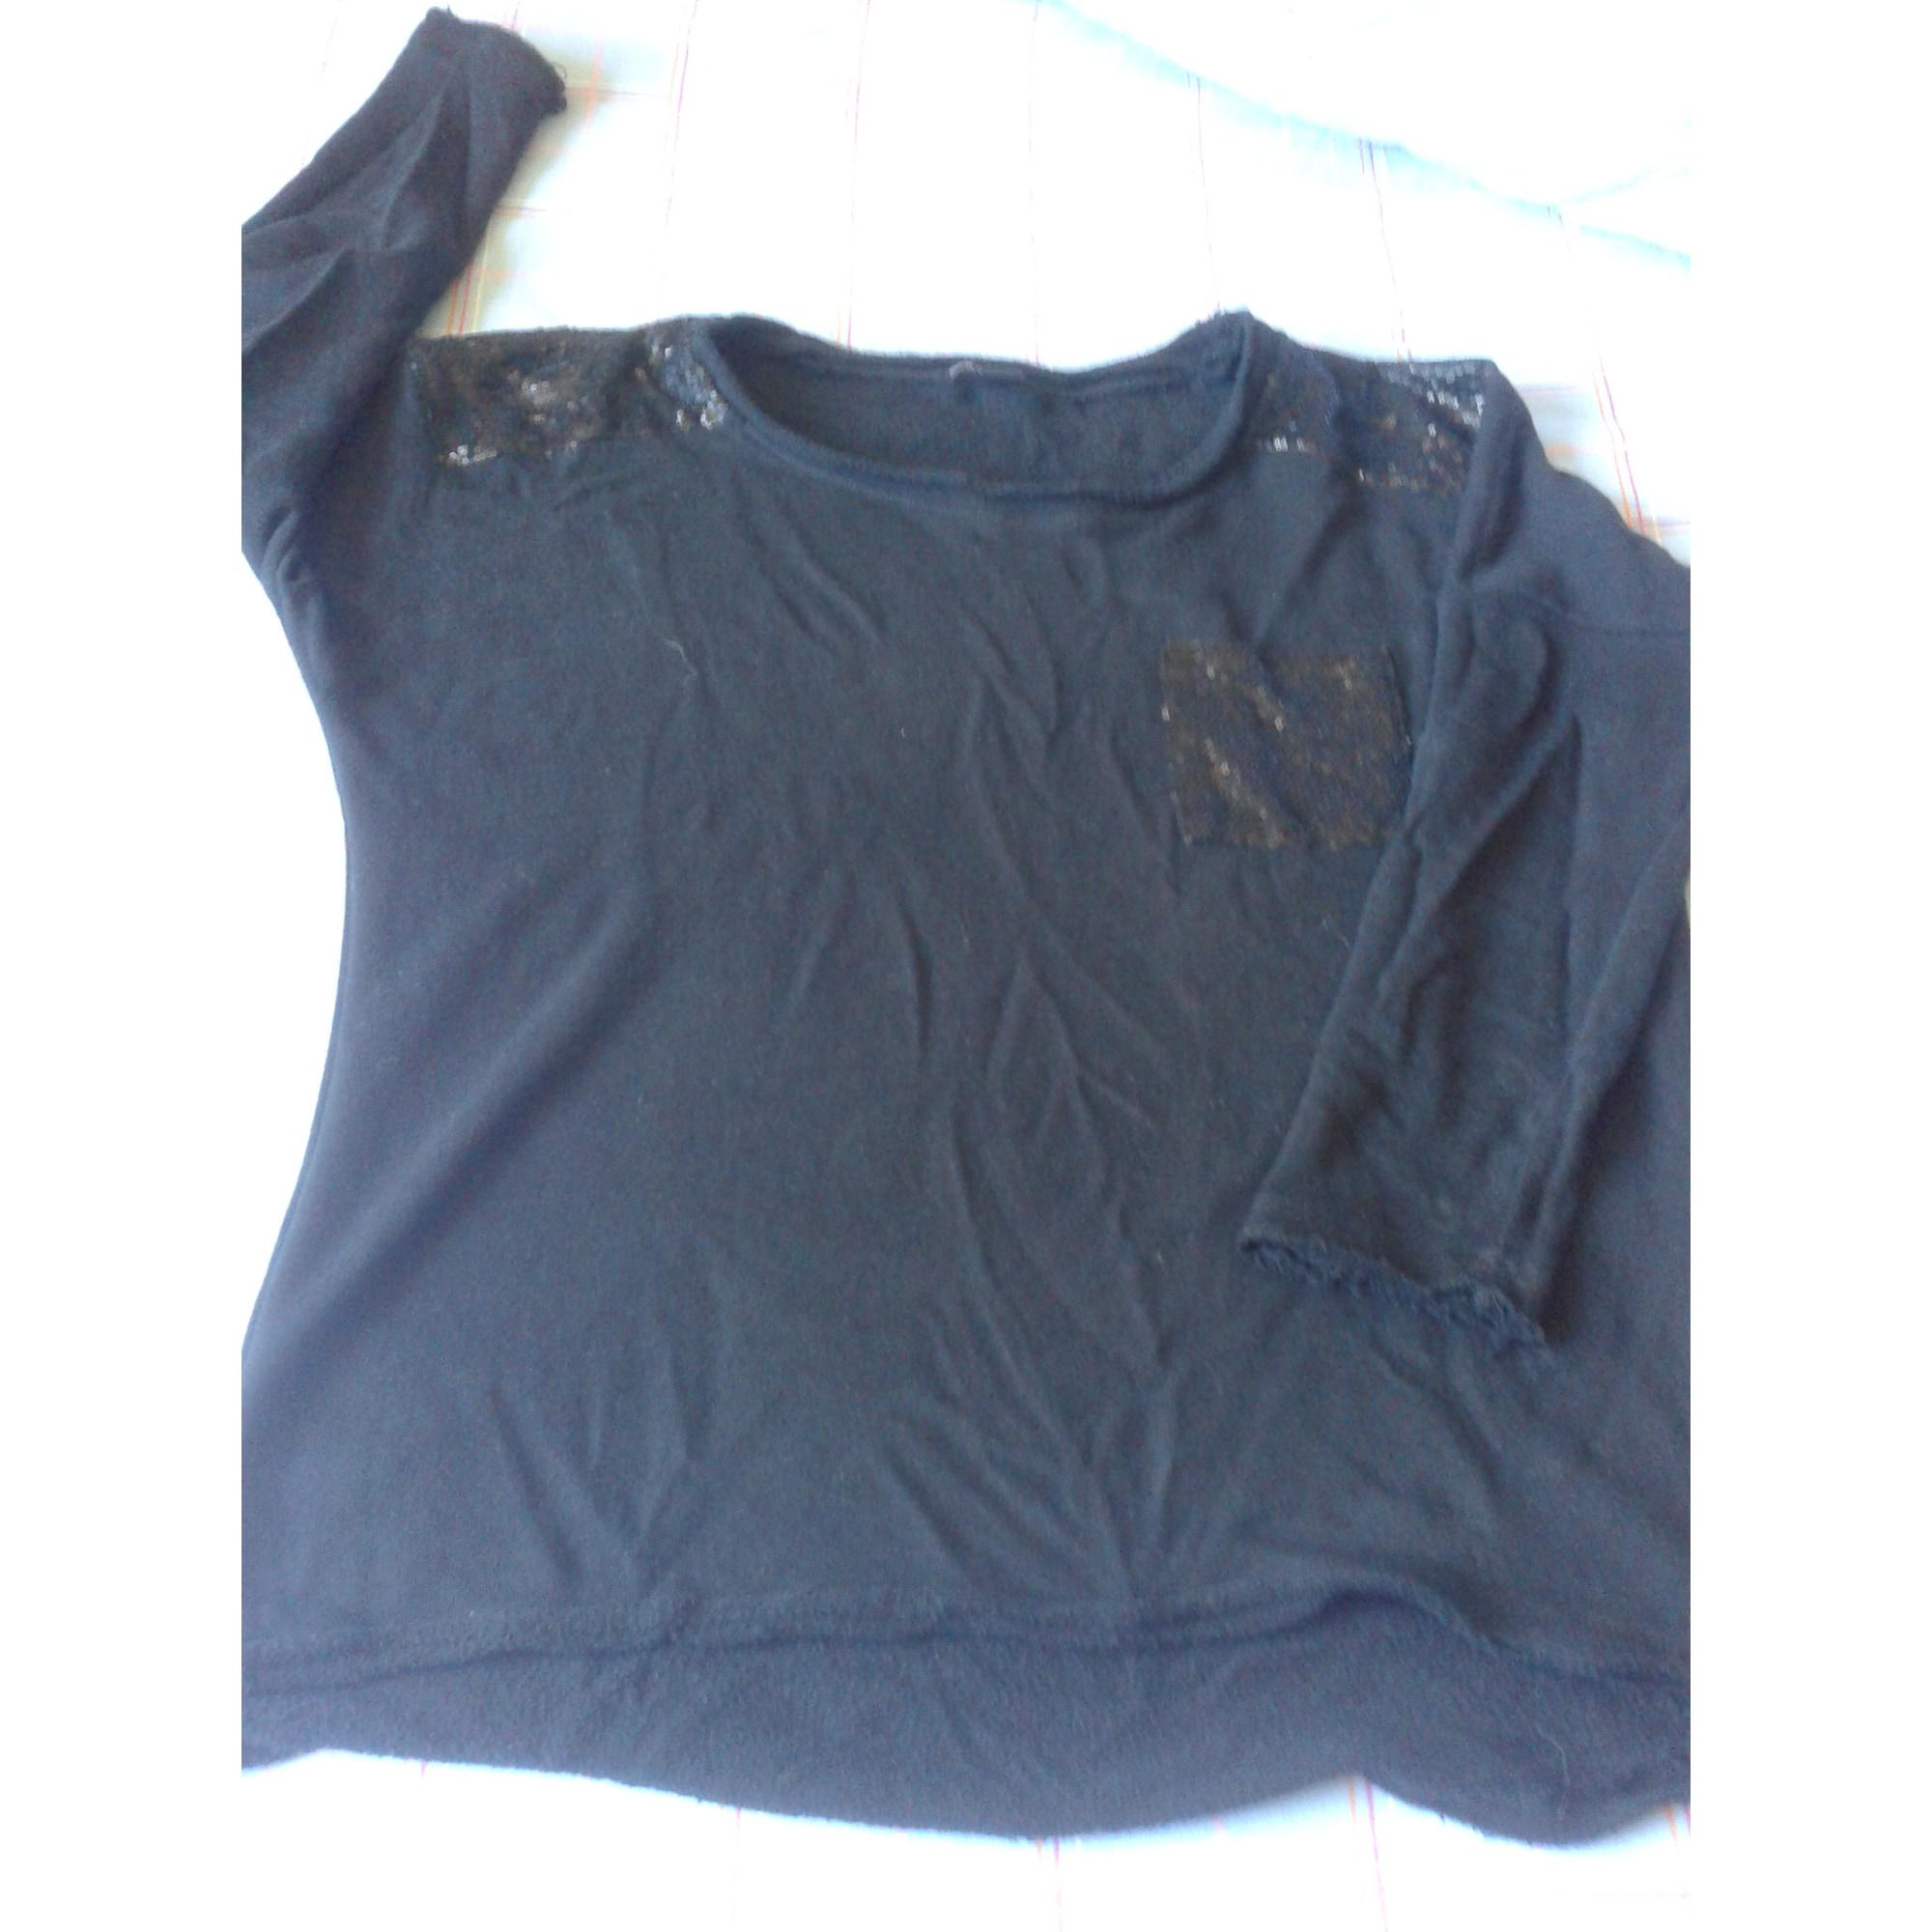 321a4ca2ece Tunic Sweater AMISU 36 (S, T1) black - 2570987